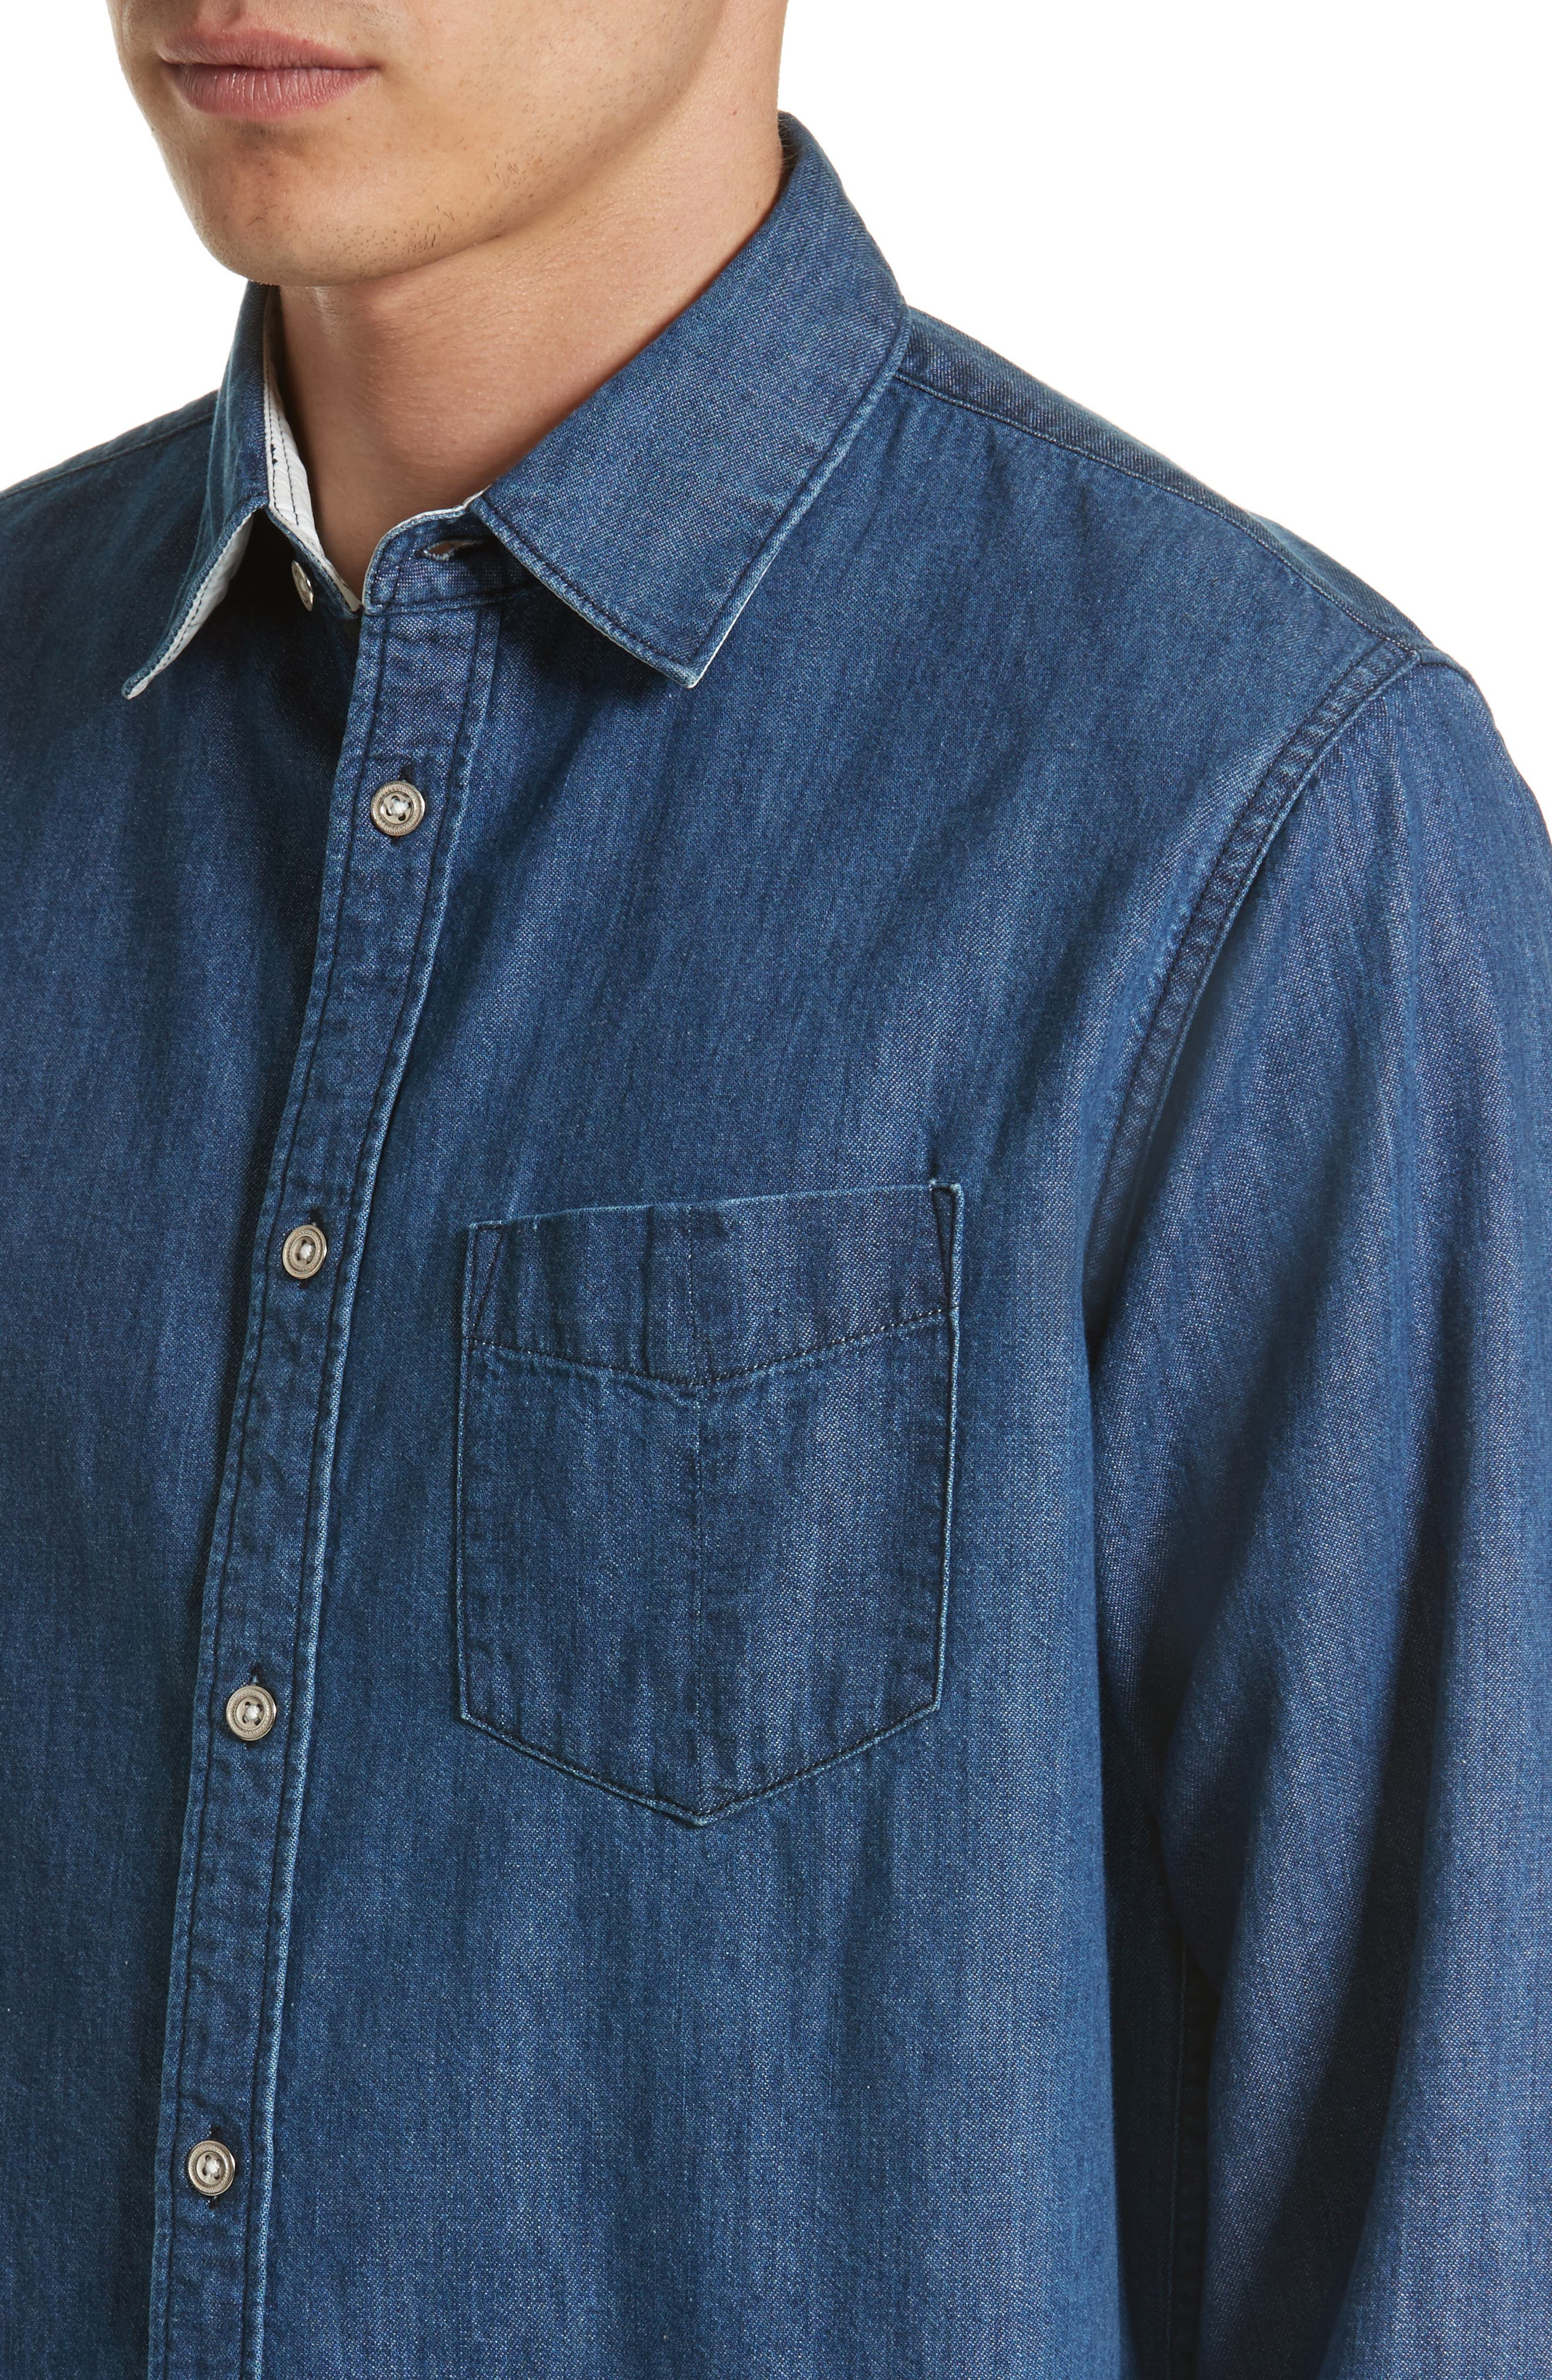 Fit 3 Woven Denim Shirt,                             Alternate thumbnail 5, color,                             Indigo